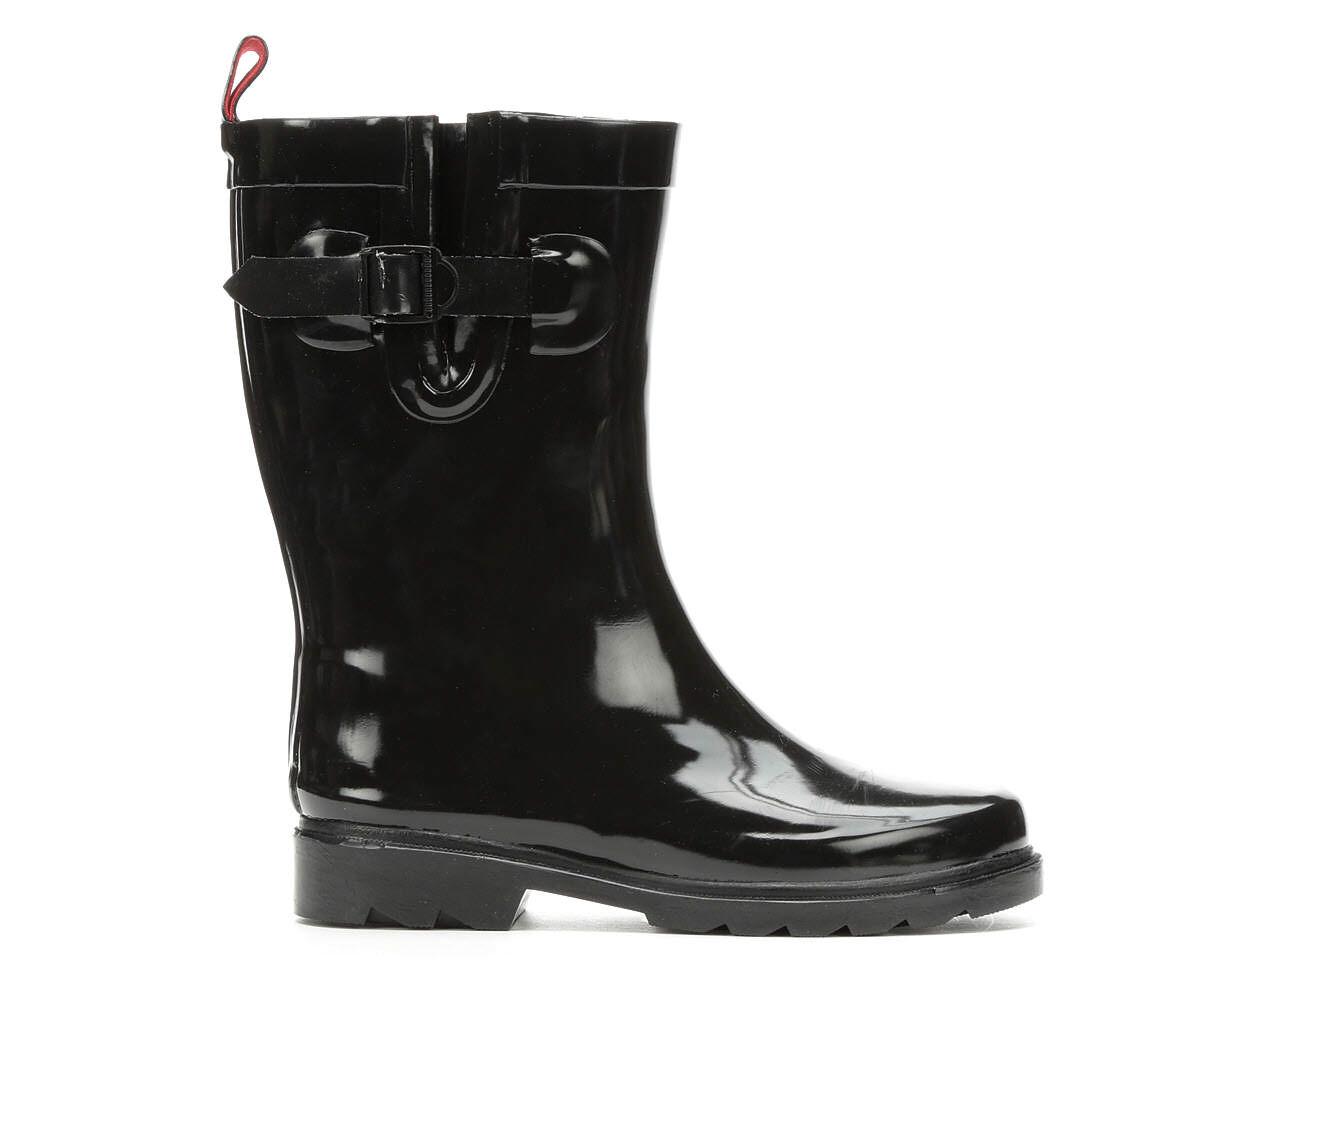 Best Quality Women's Capelli New York Shiny Solid Mid Rain Boots Black